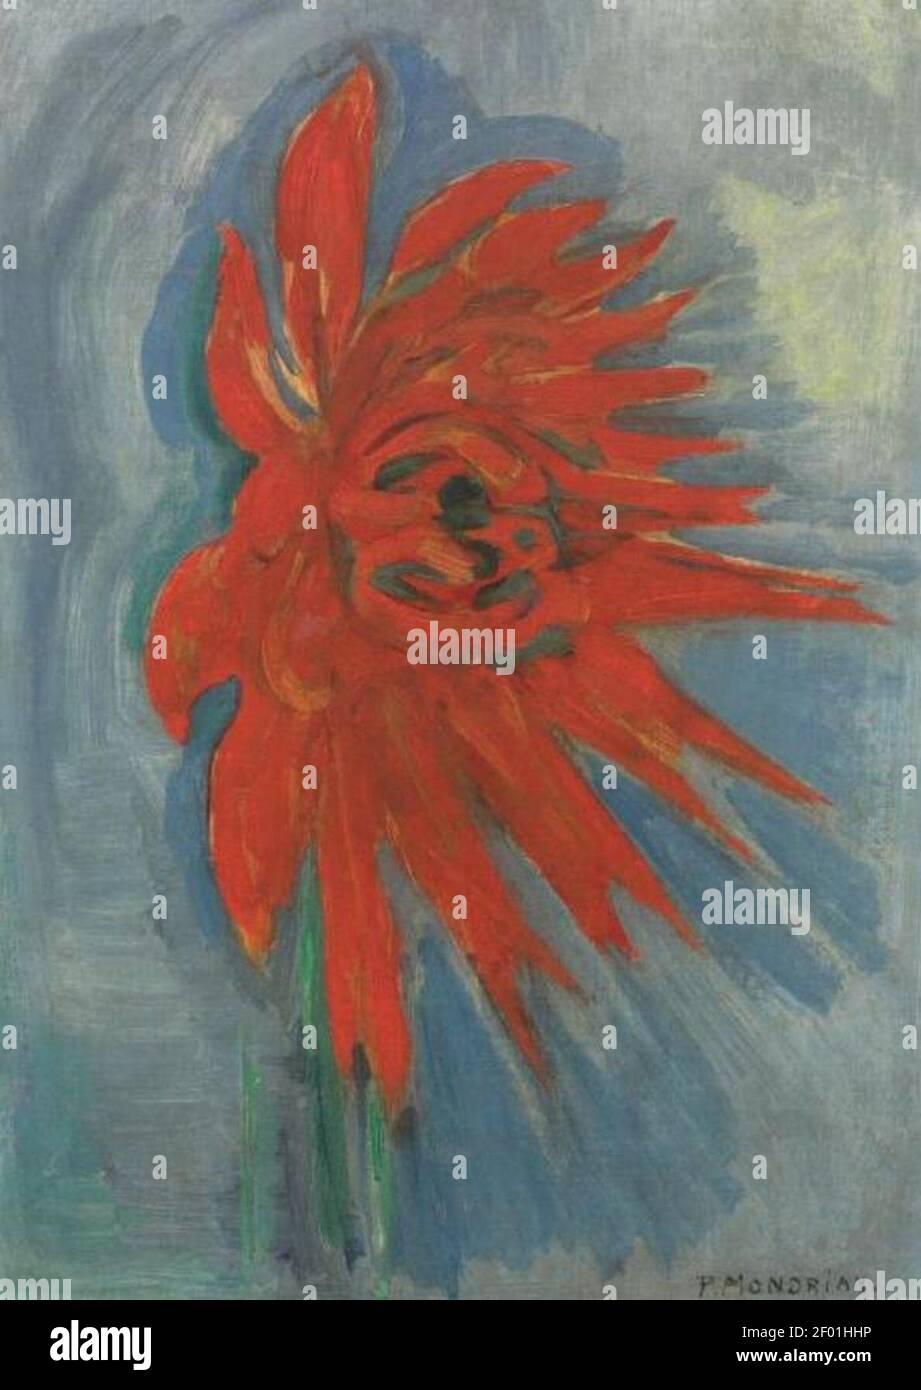 Piet Mondriaan - crianthemo rojo sobre fondo azul - Foto de stock